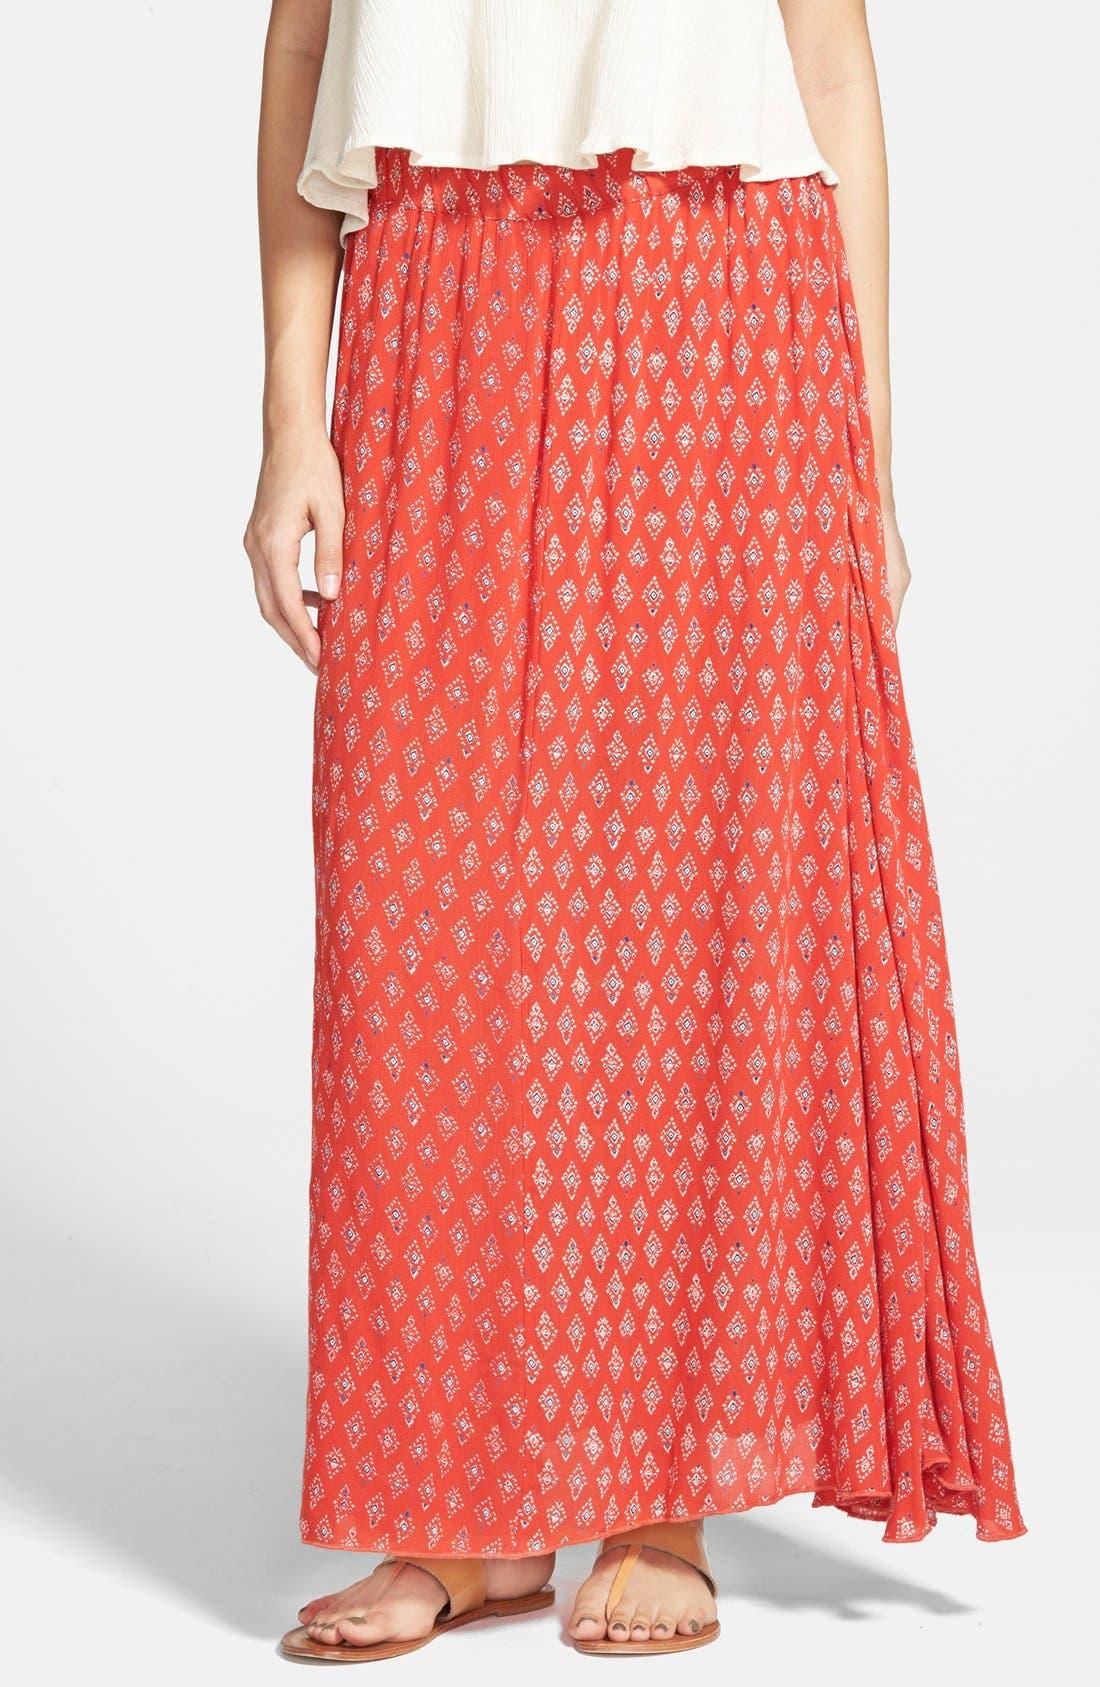 Alternate Image 1 Selected - Billabong 'Don't Think of It' Print Maxi Skirt